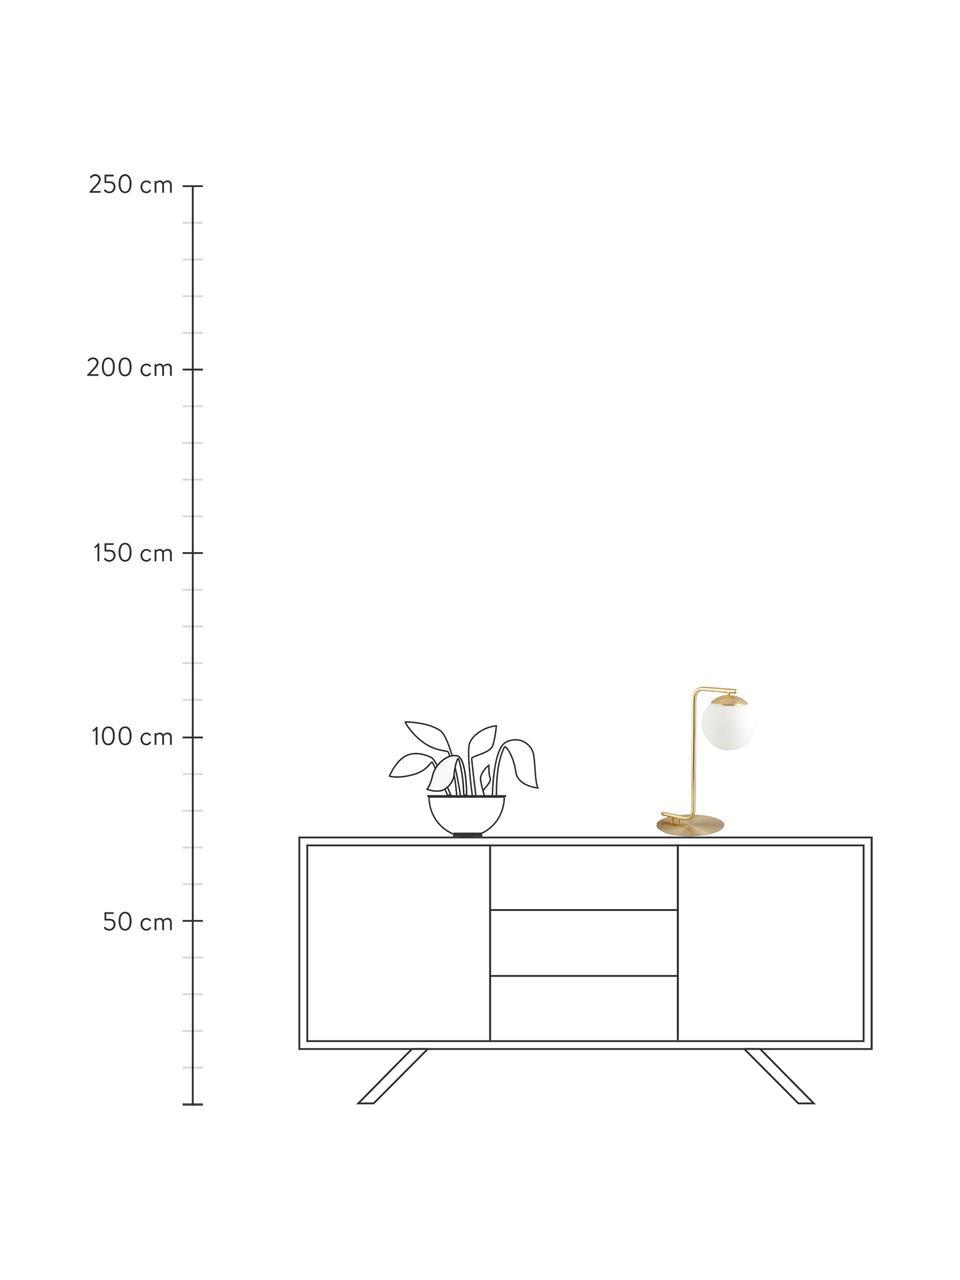 Tischlampe Grant in Messing, Lampenfuß: Messing, Lampenschirm: Opalglas, Messing, Weiß, 20 x 41 cm